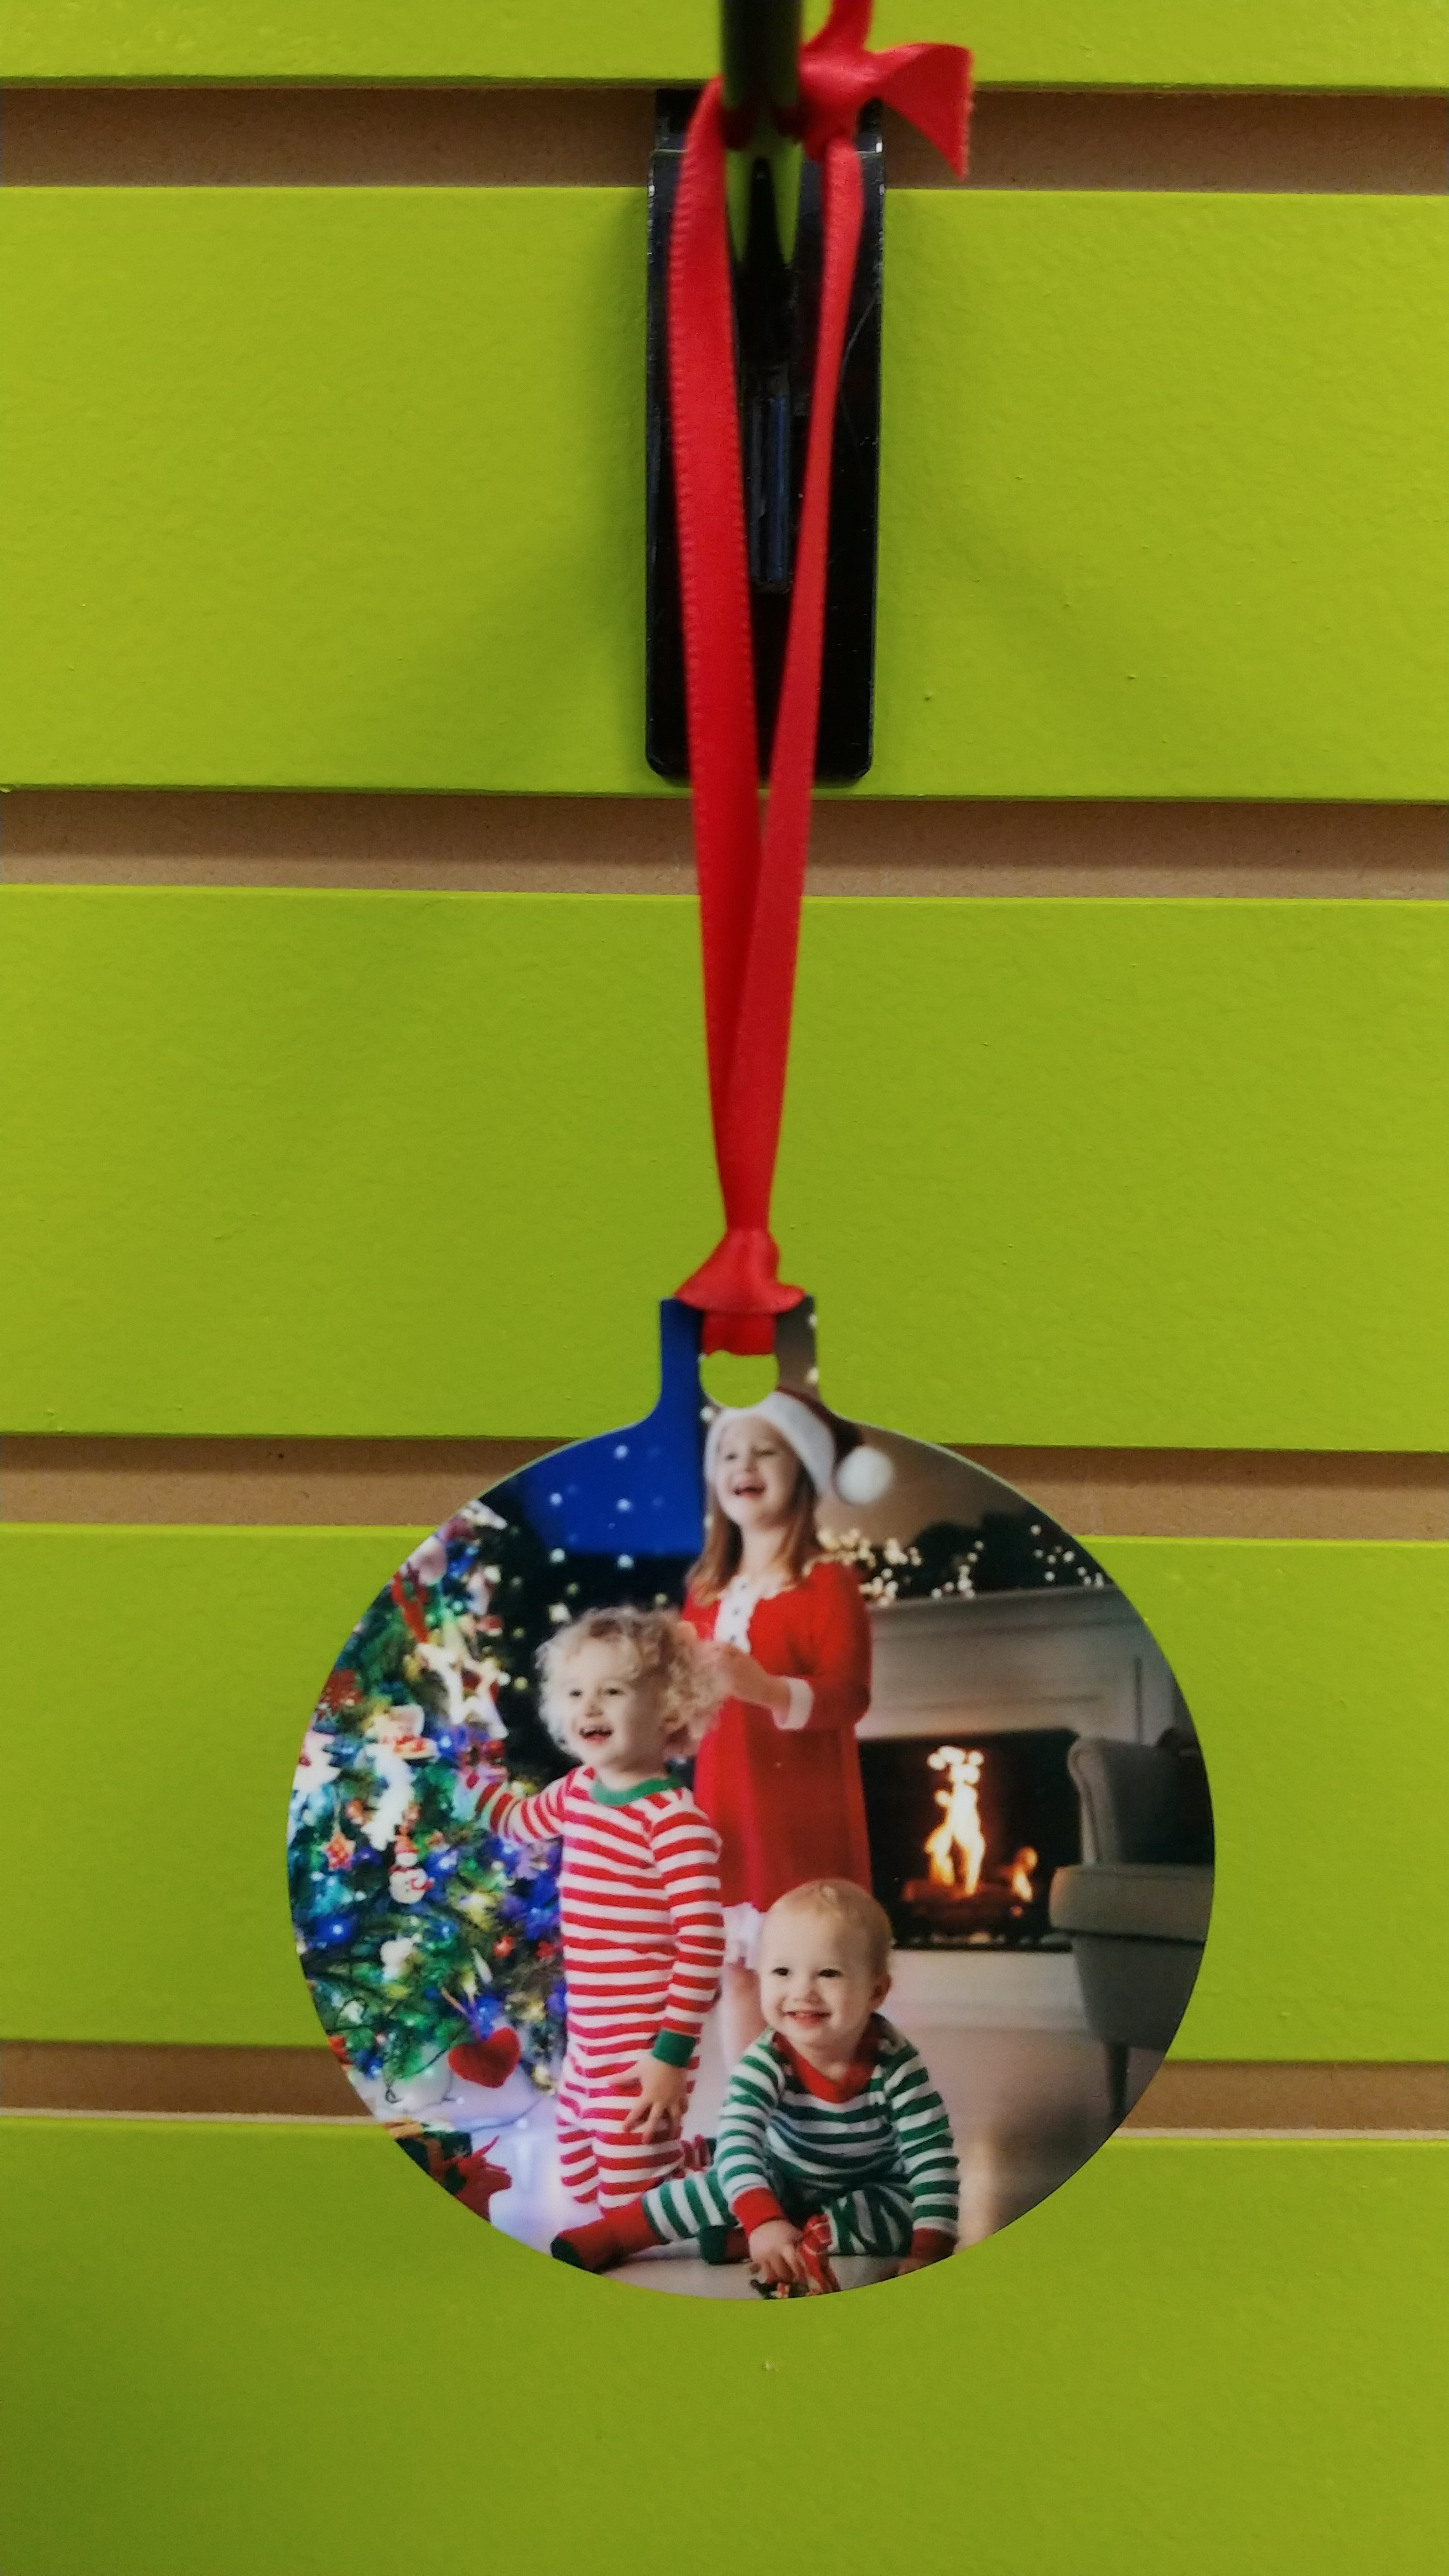 Ornament: Full Custom Ornament 2 Different Photos